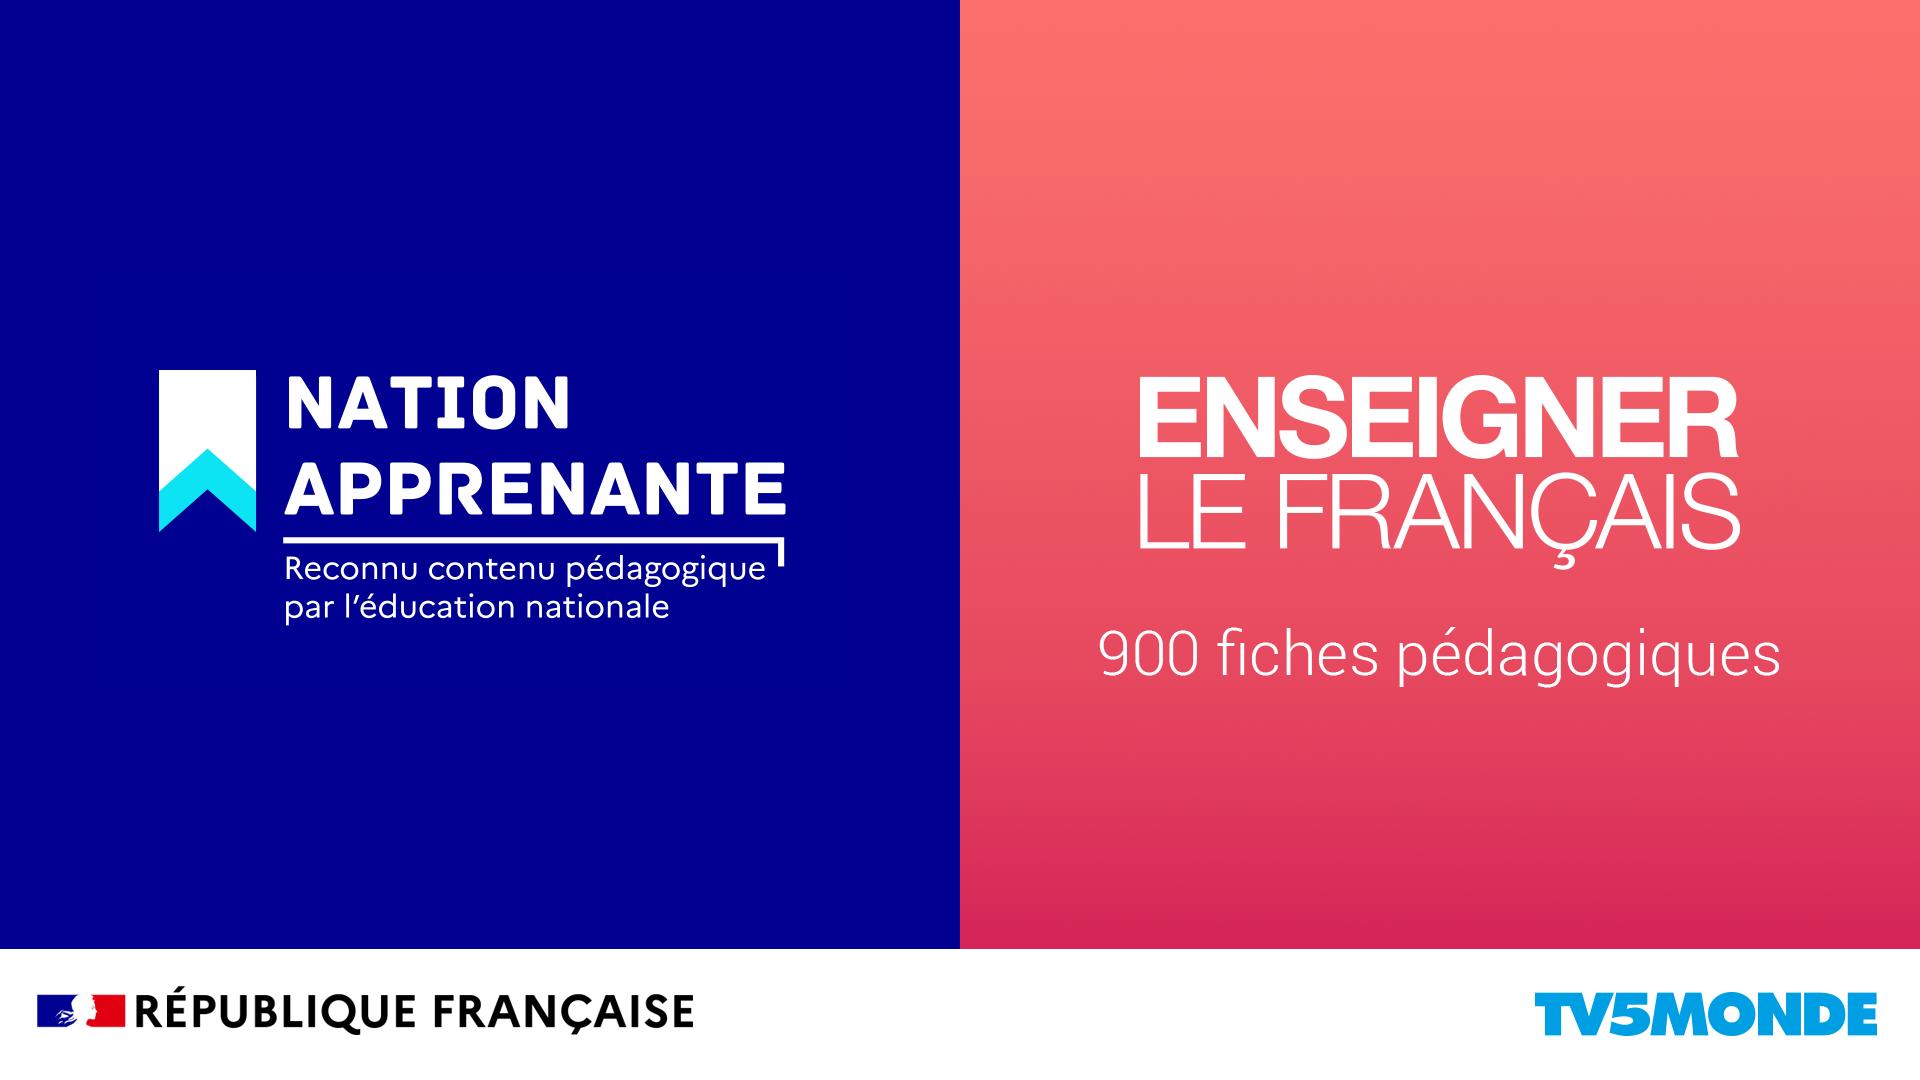 Nation apprenante : TV5MONDE s'engage | Enseigner le français avec TV5MONDE